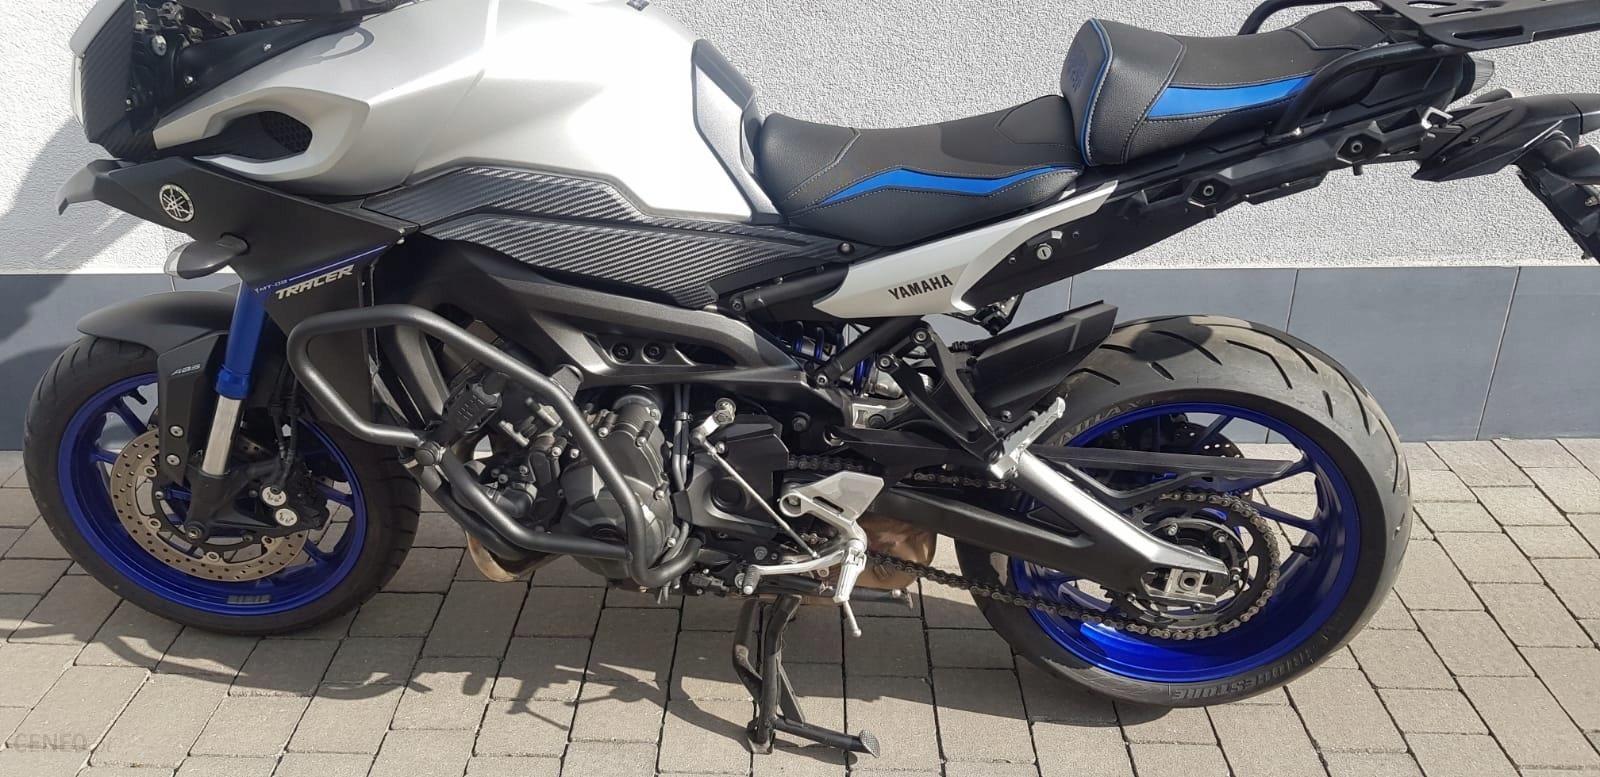 Yamaha Mt 09 Tracer 2015 Lubin Opinie I Ceny Na Ceneo Pl